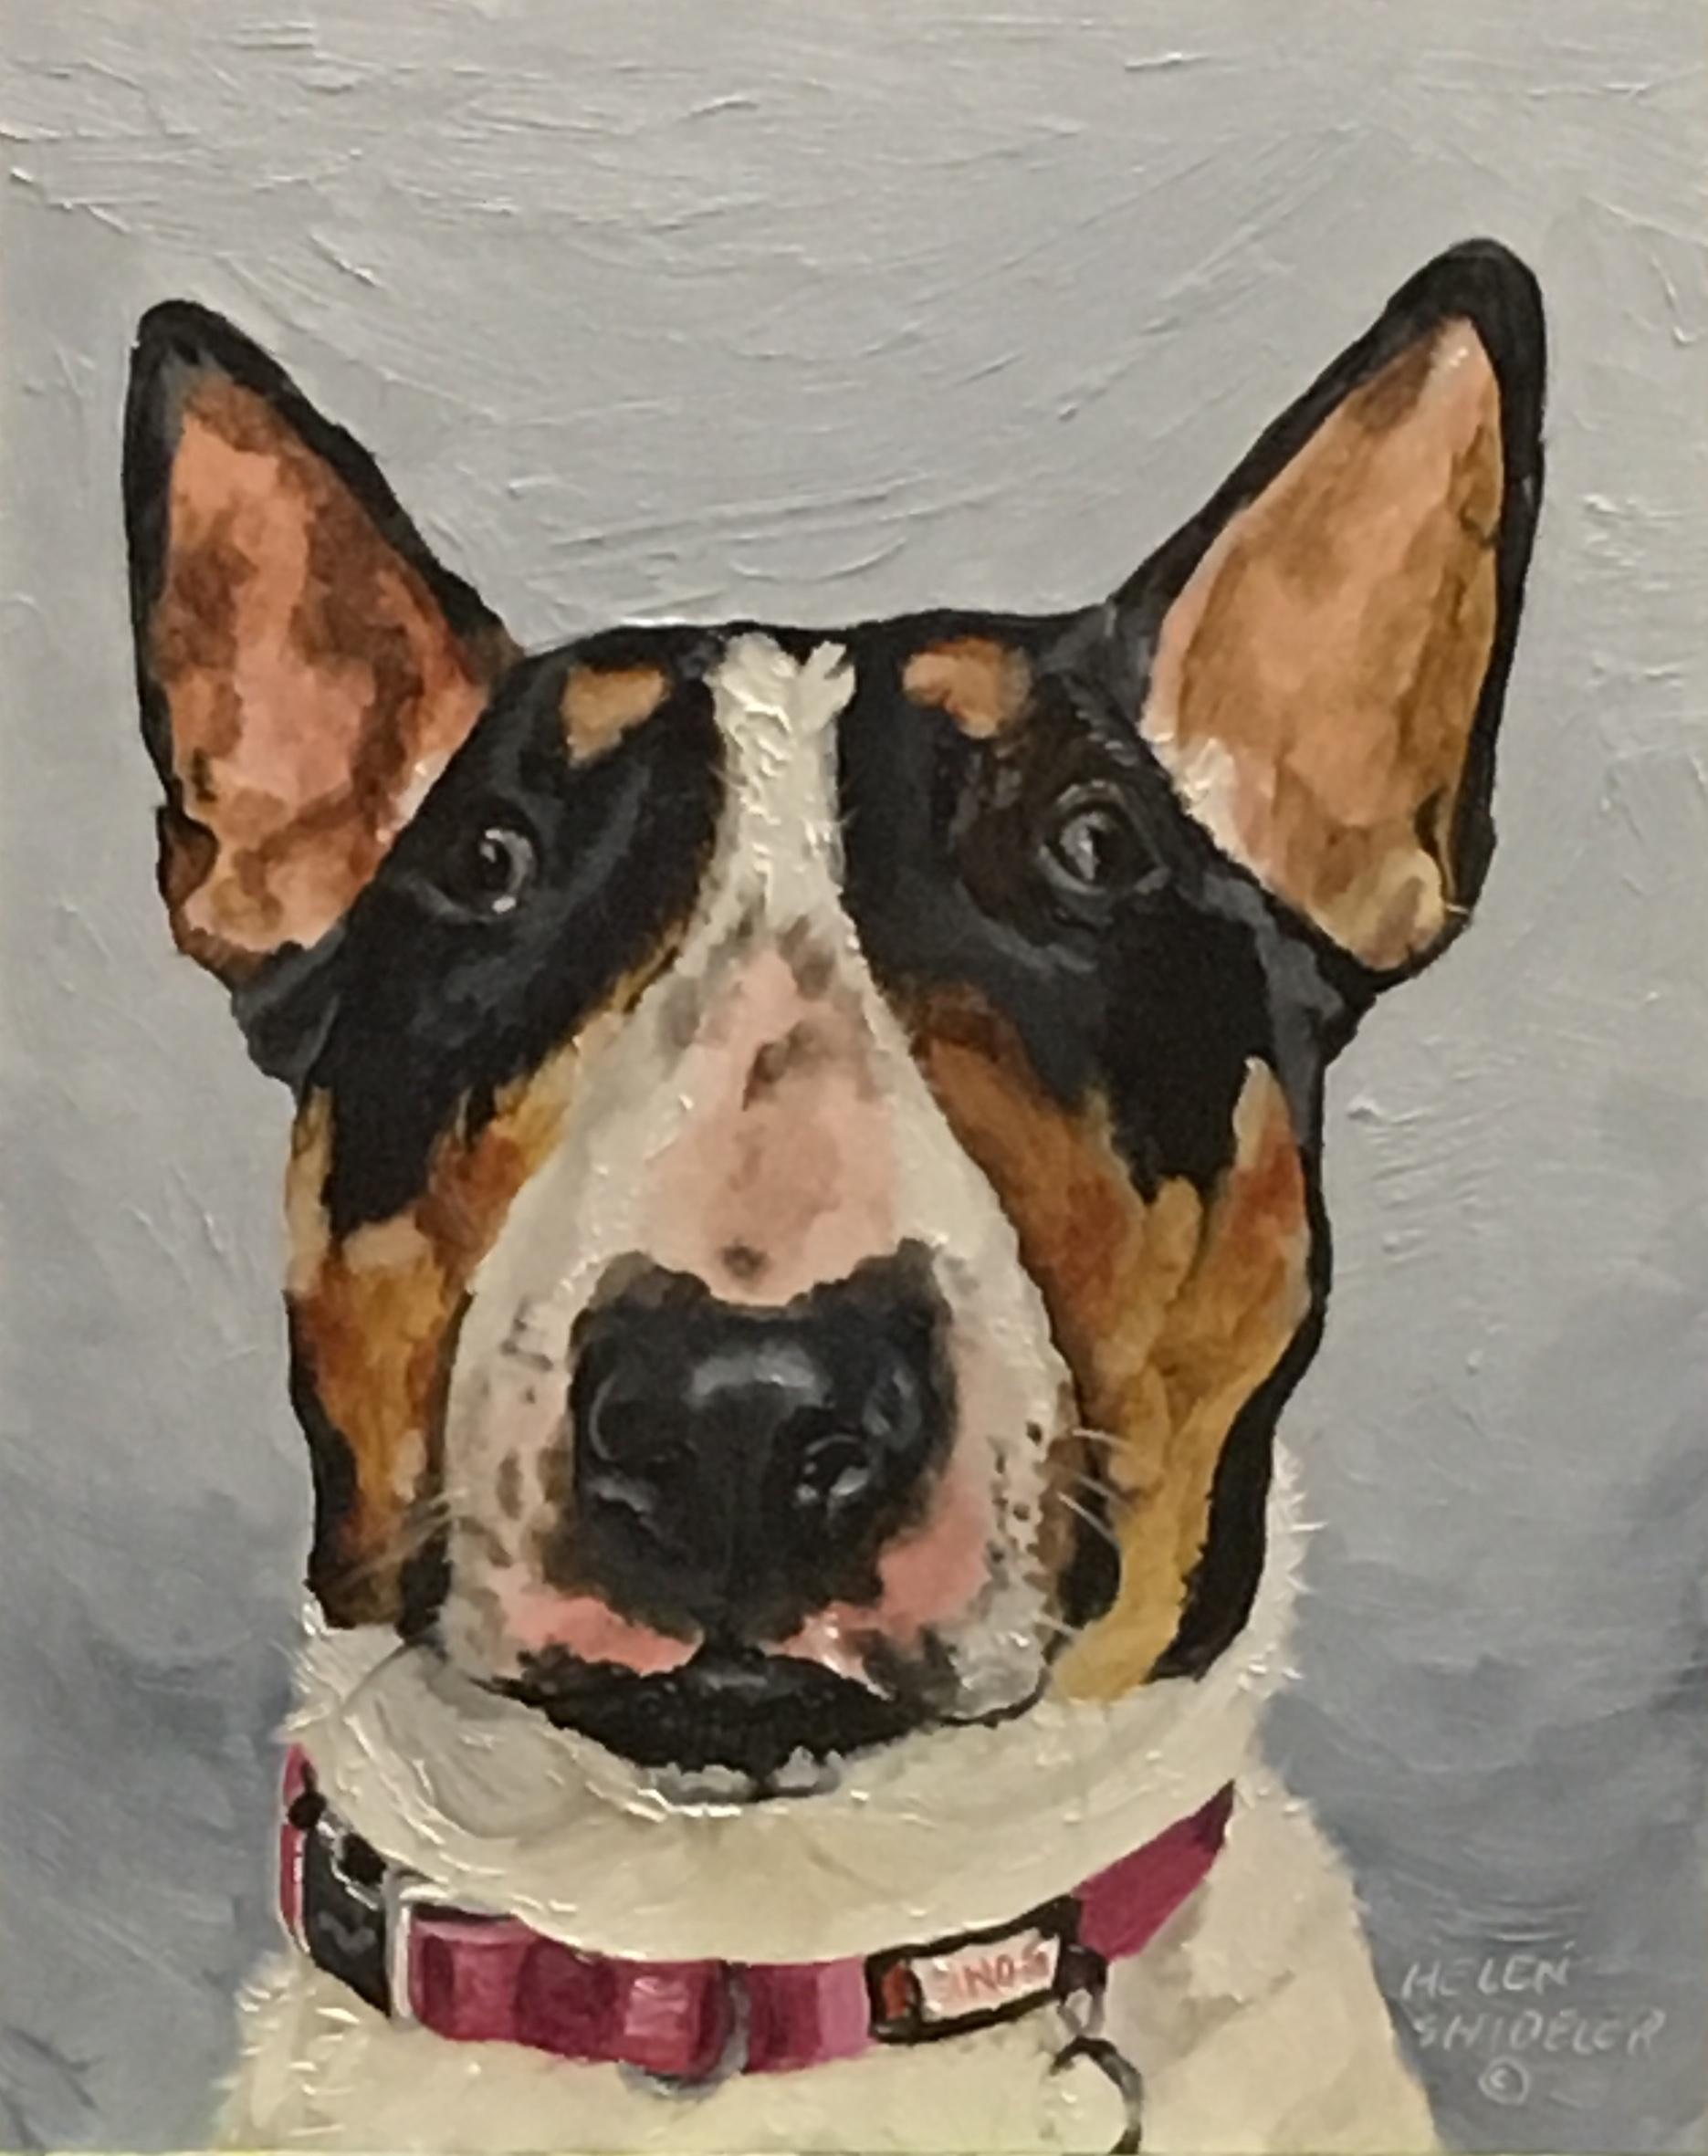 Phoebe by Helen Shideler